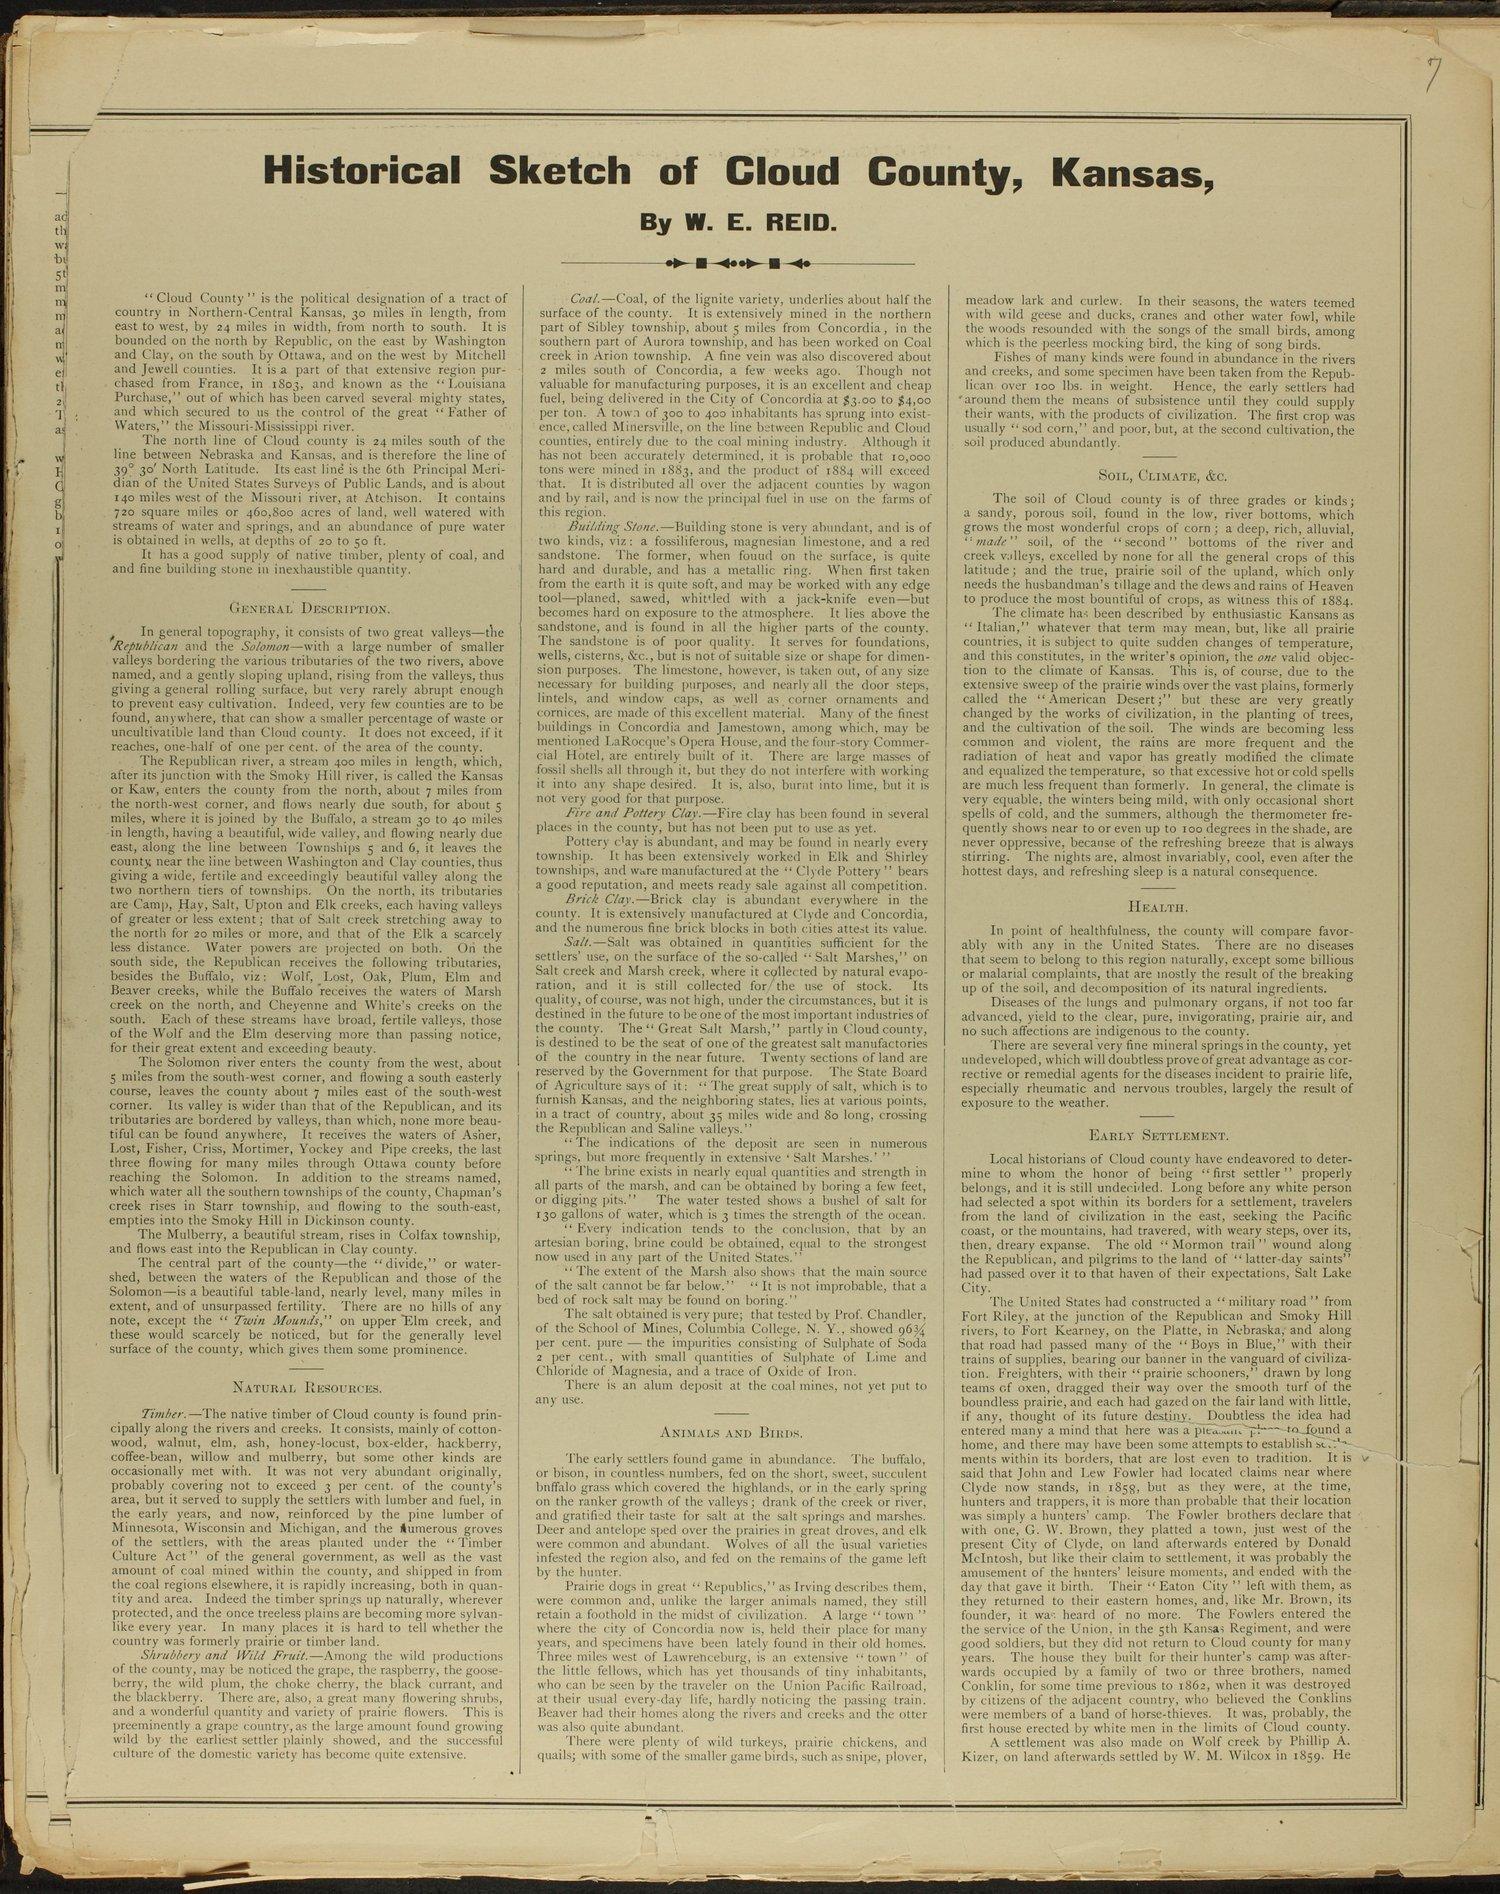 Edward's atlas of Cloud County, Kansas - 7